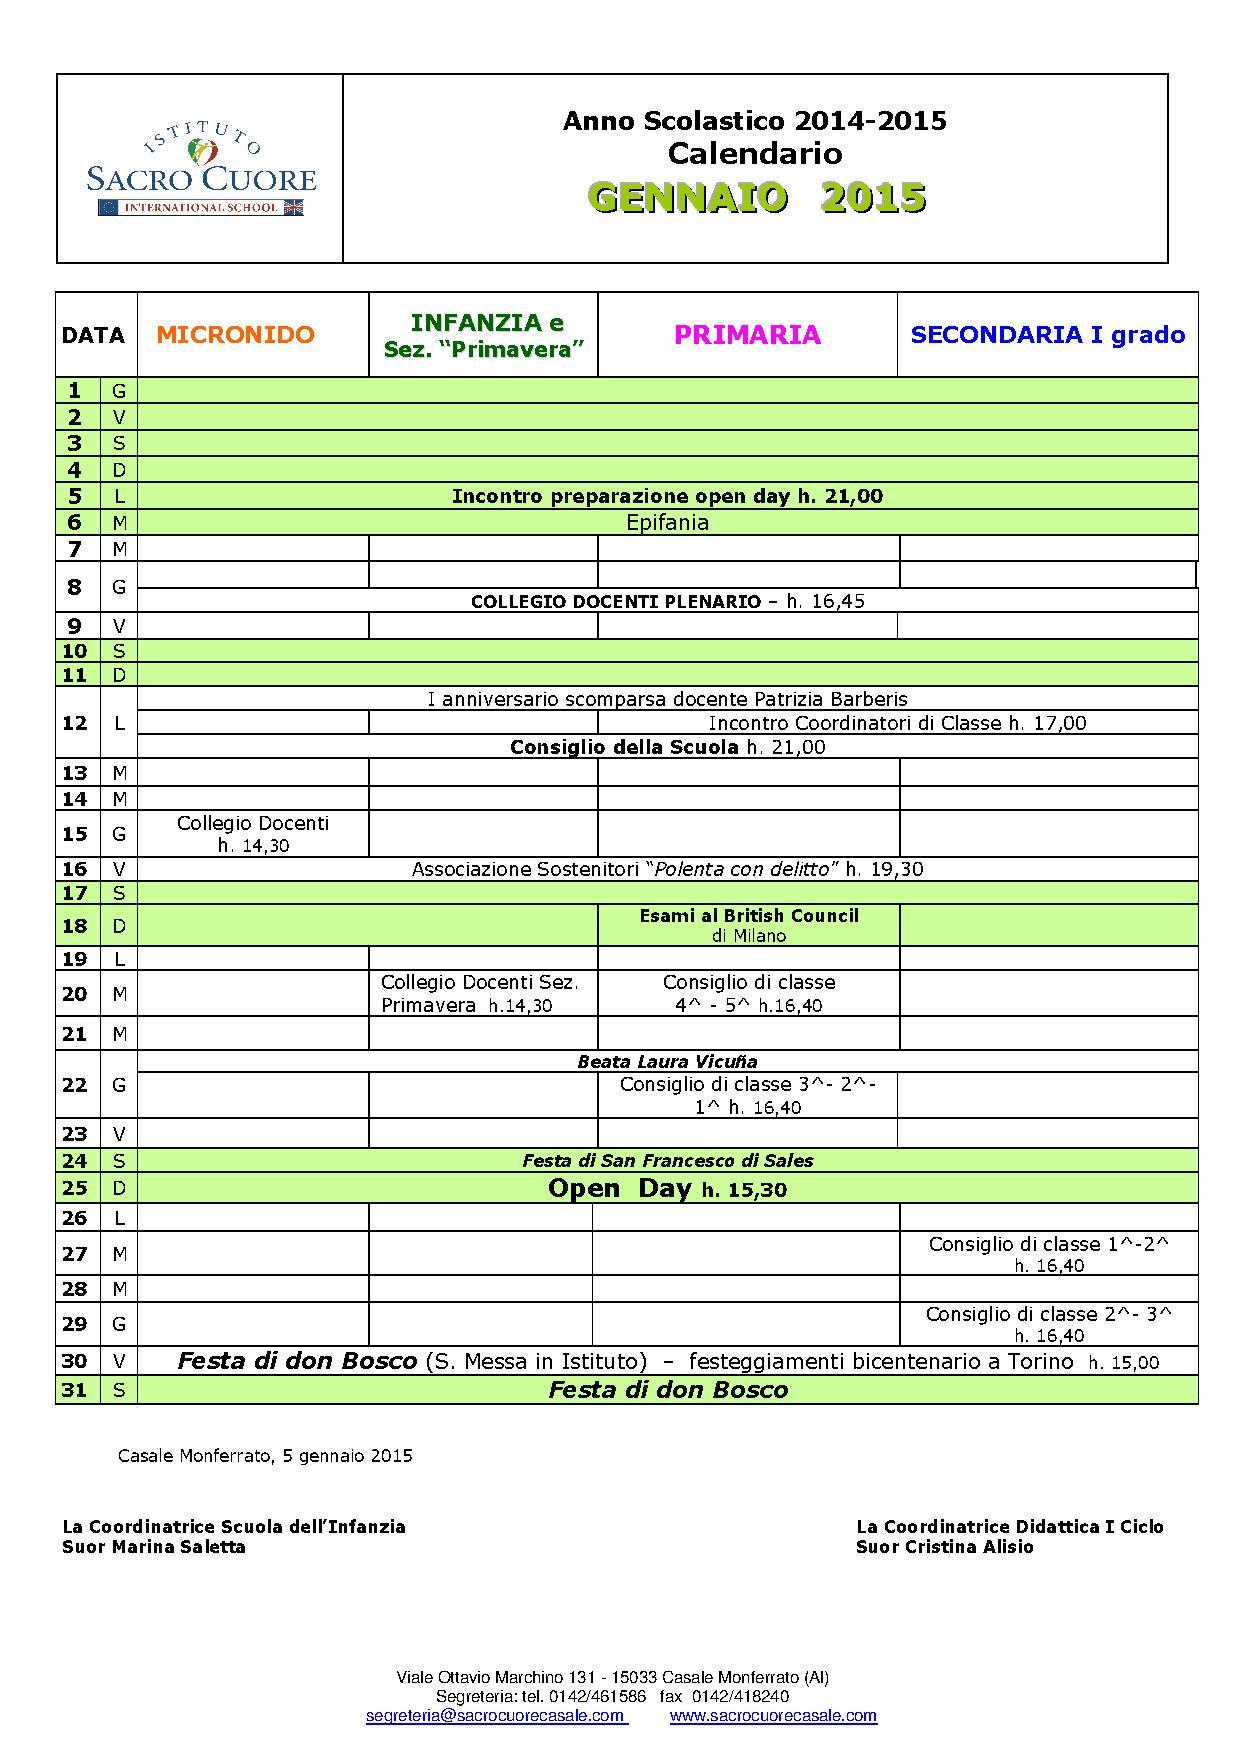 Calendario Mese Di Gennaio 2015  U2013 Sacro Cuore Casale